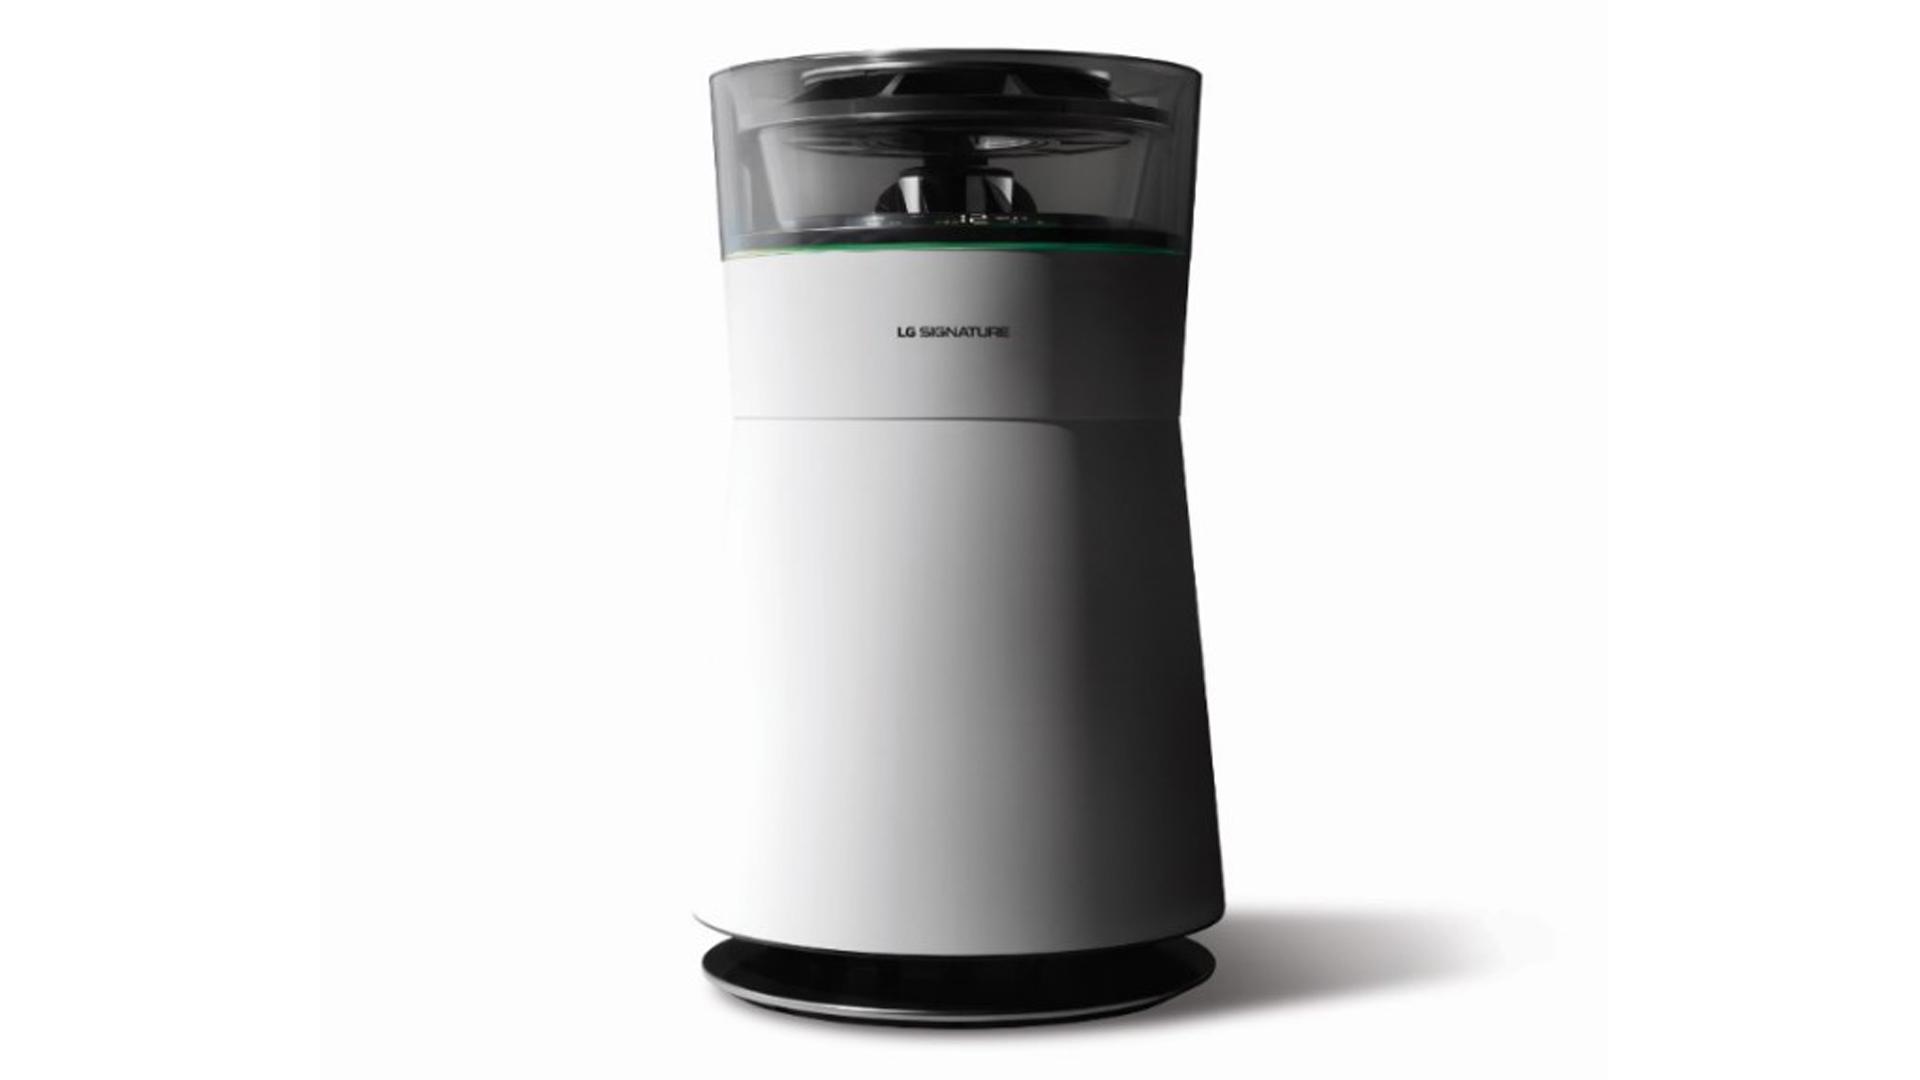 LG SIGNATURE Air Purifier